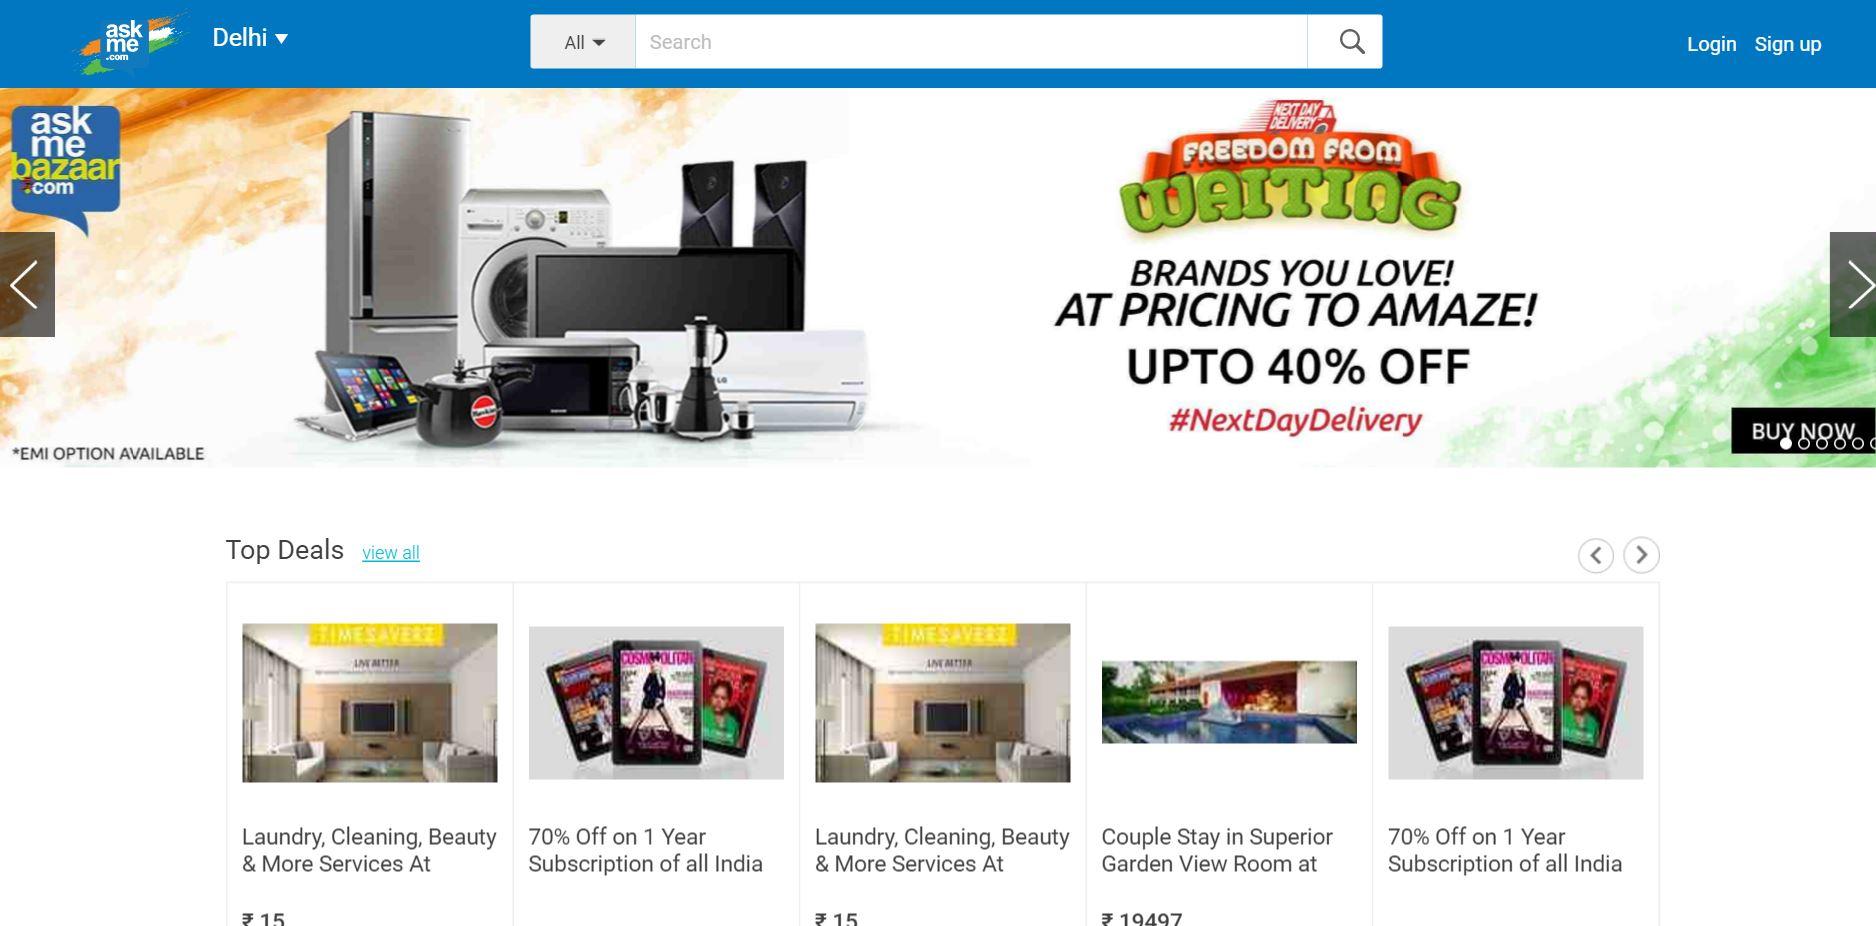 Cash crunch kills Indian e-retailer AskMe